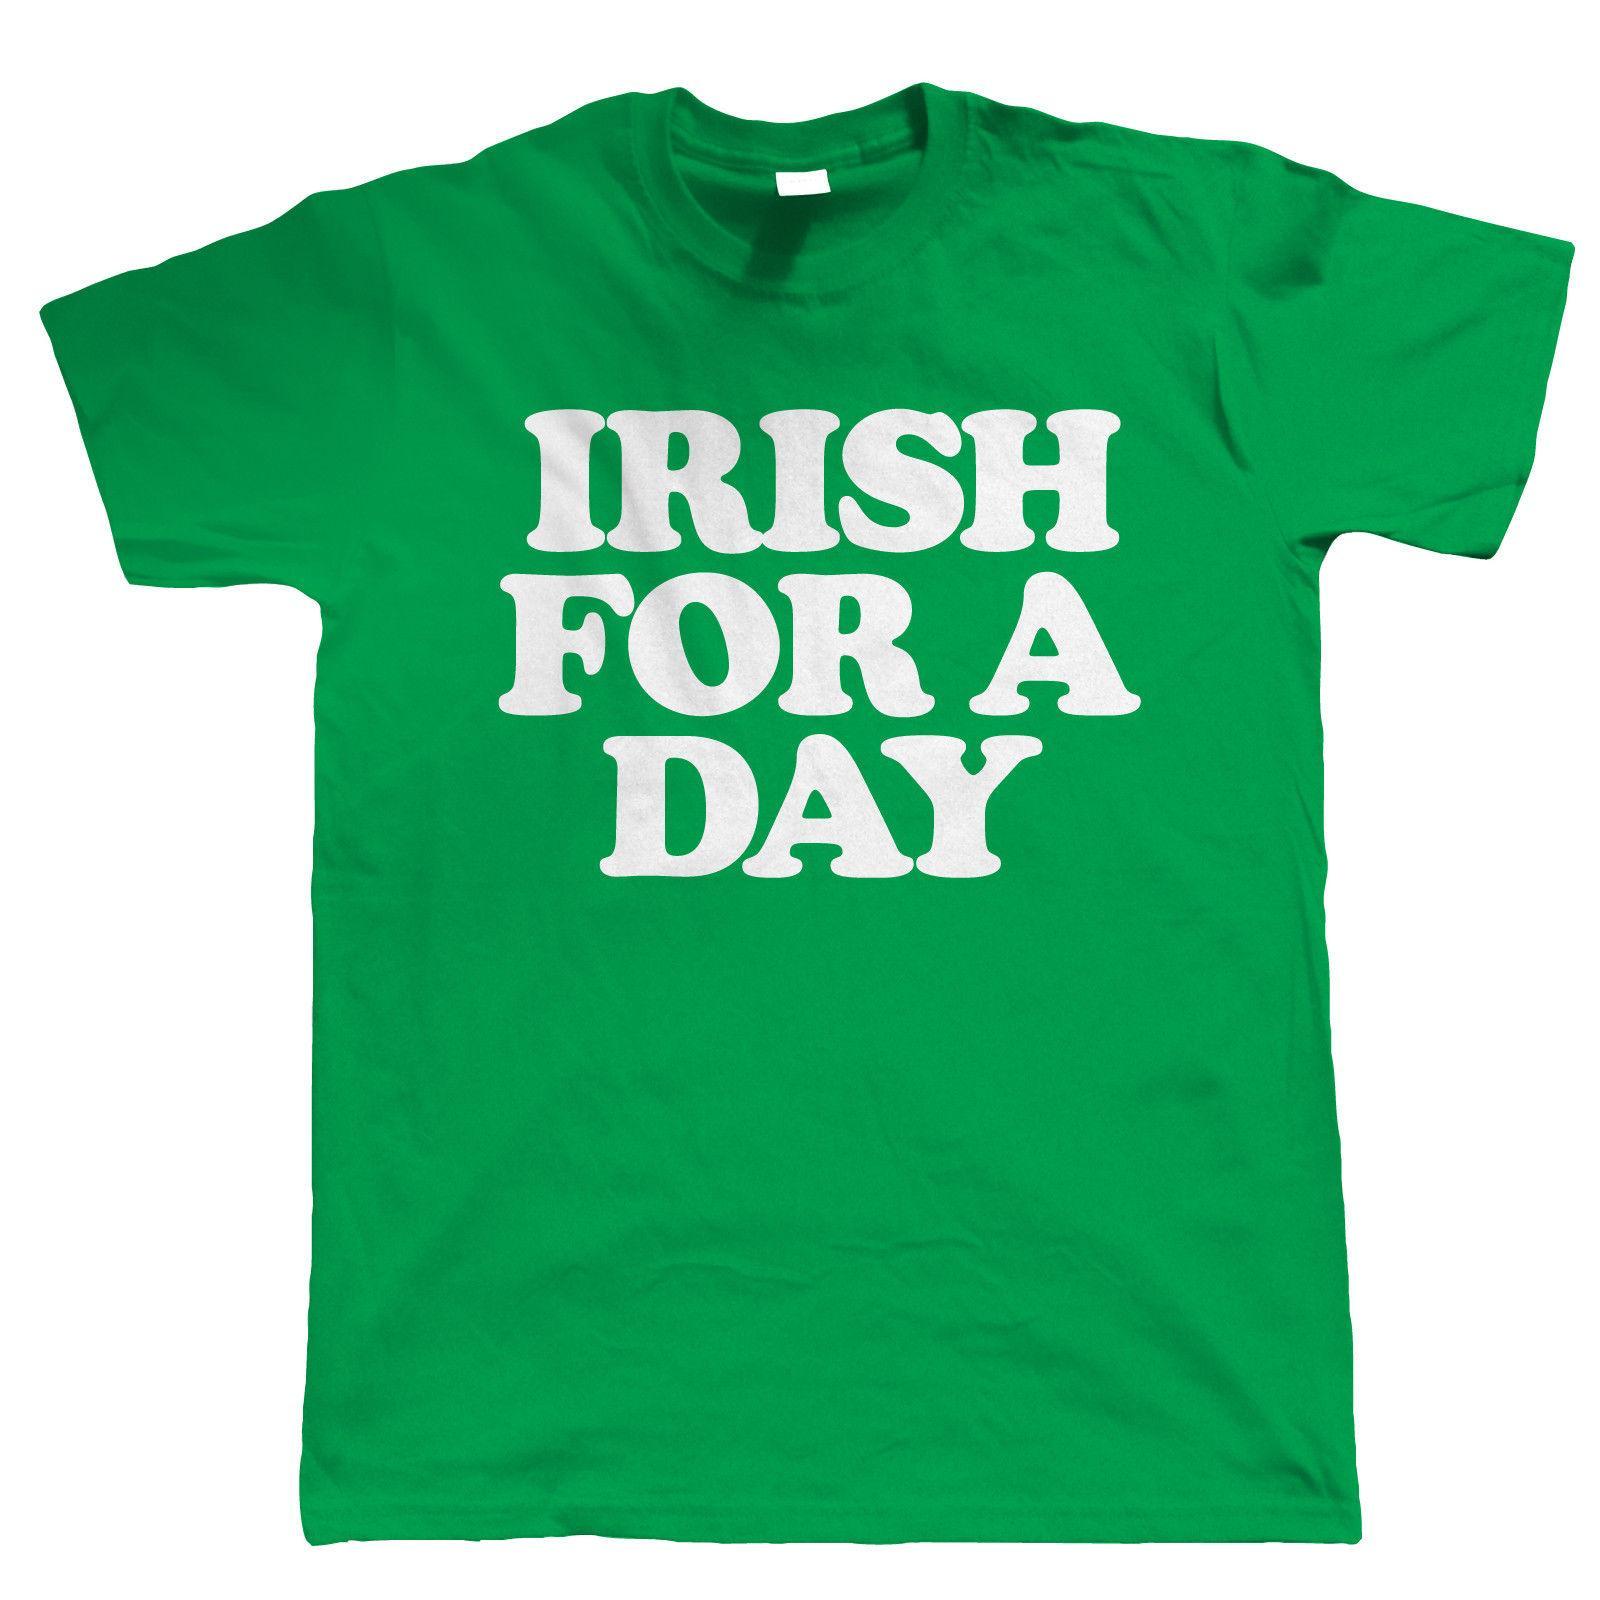 ab2ccd723 Funny Tee Shirts Ireland - DREAMWORKS